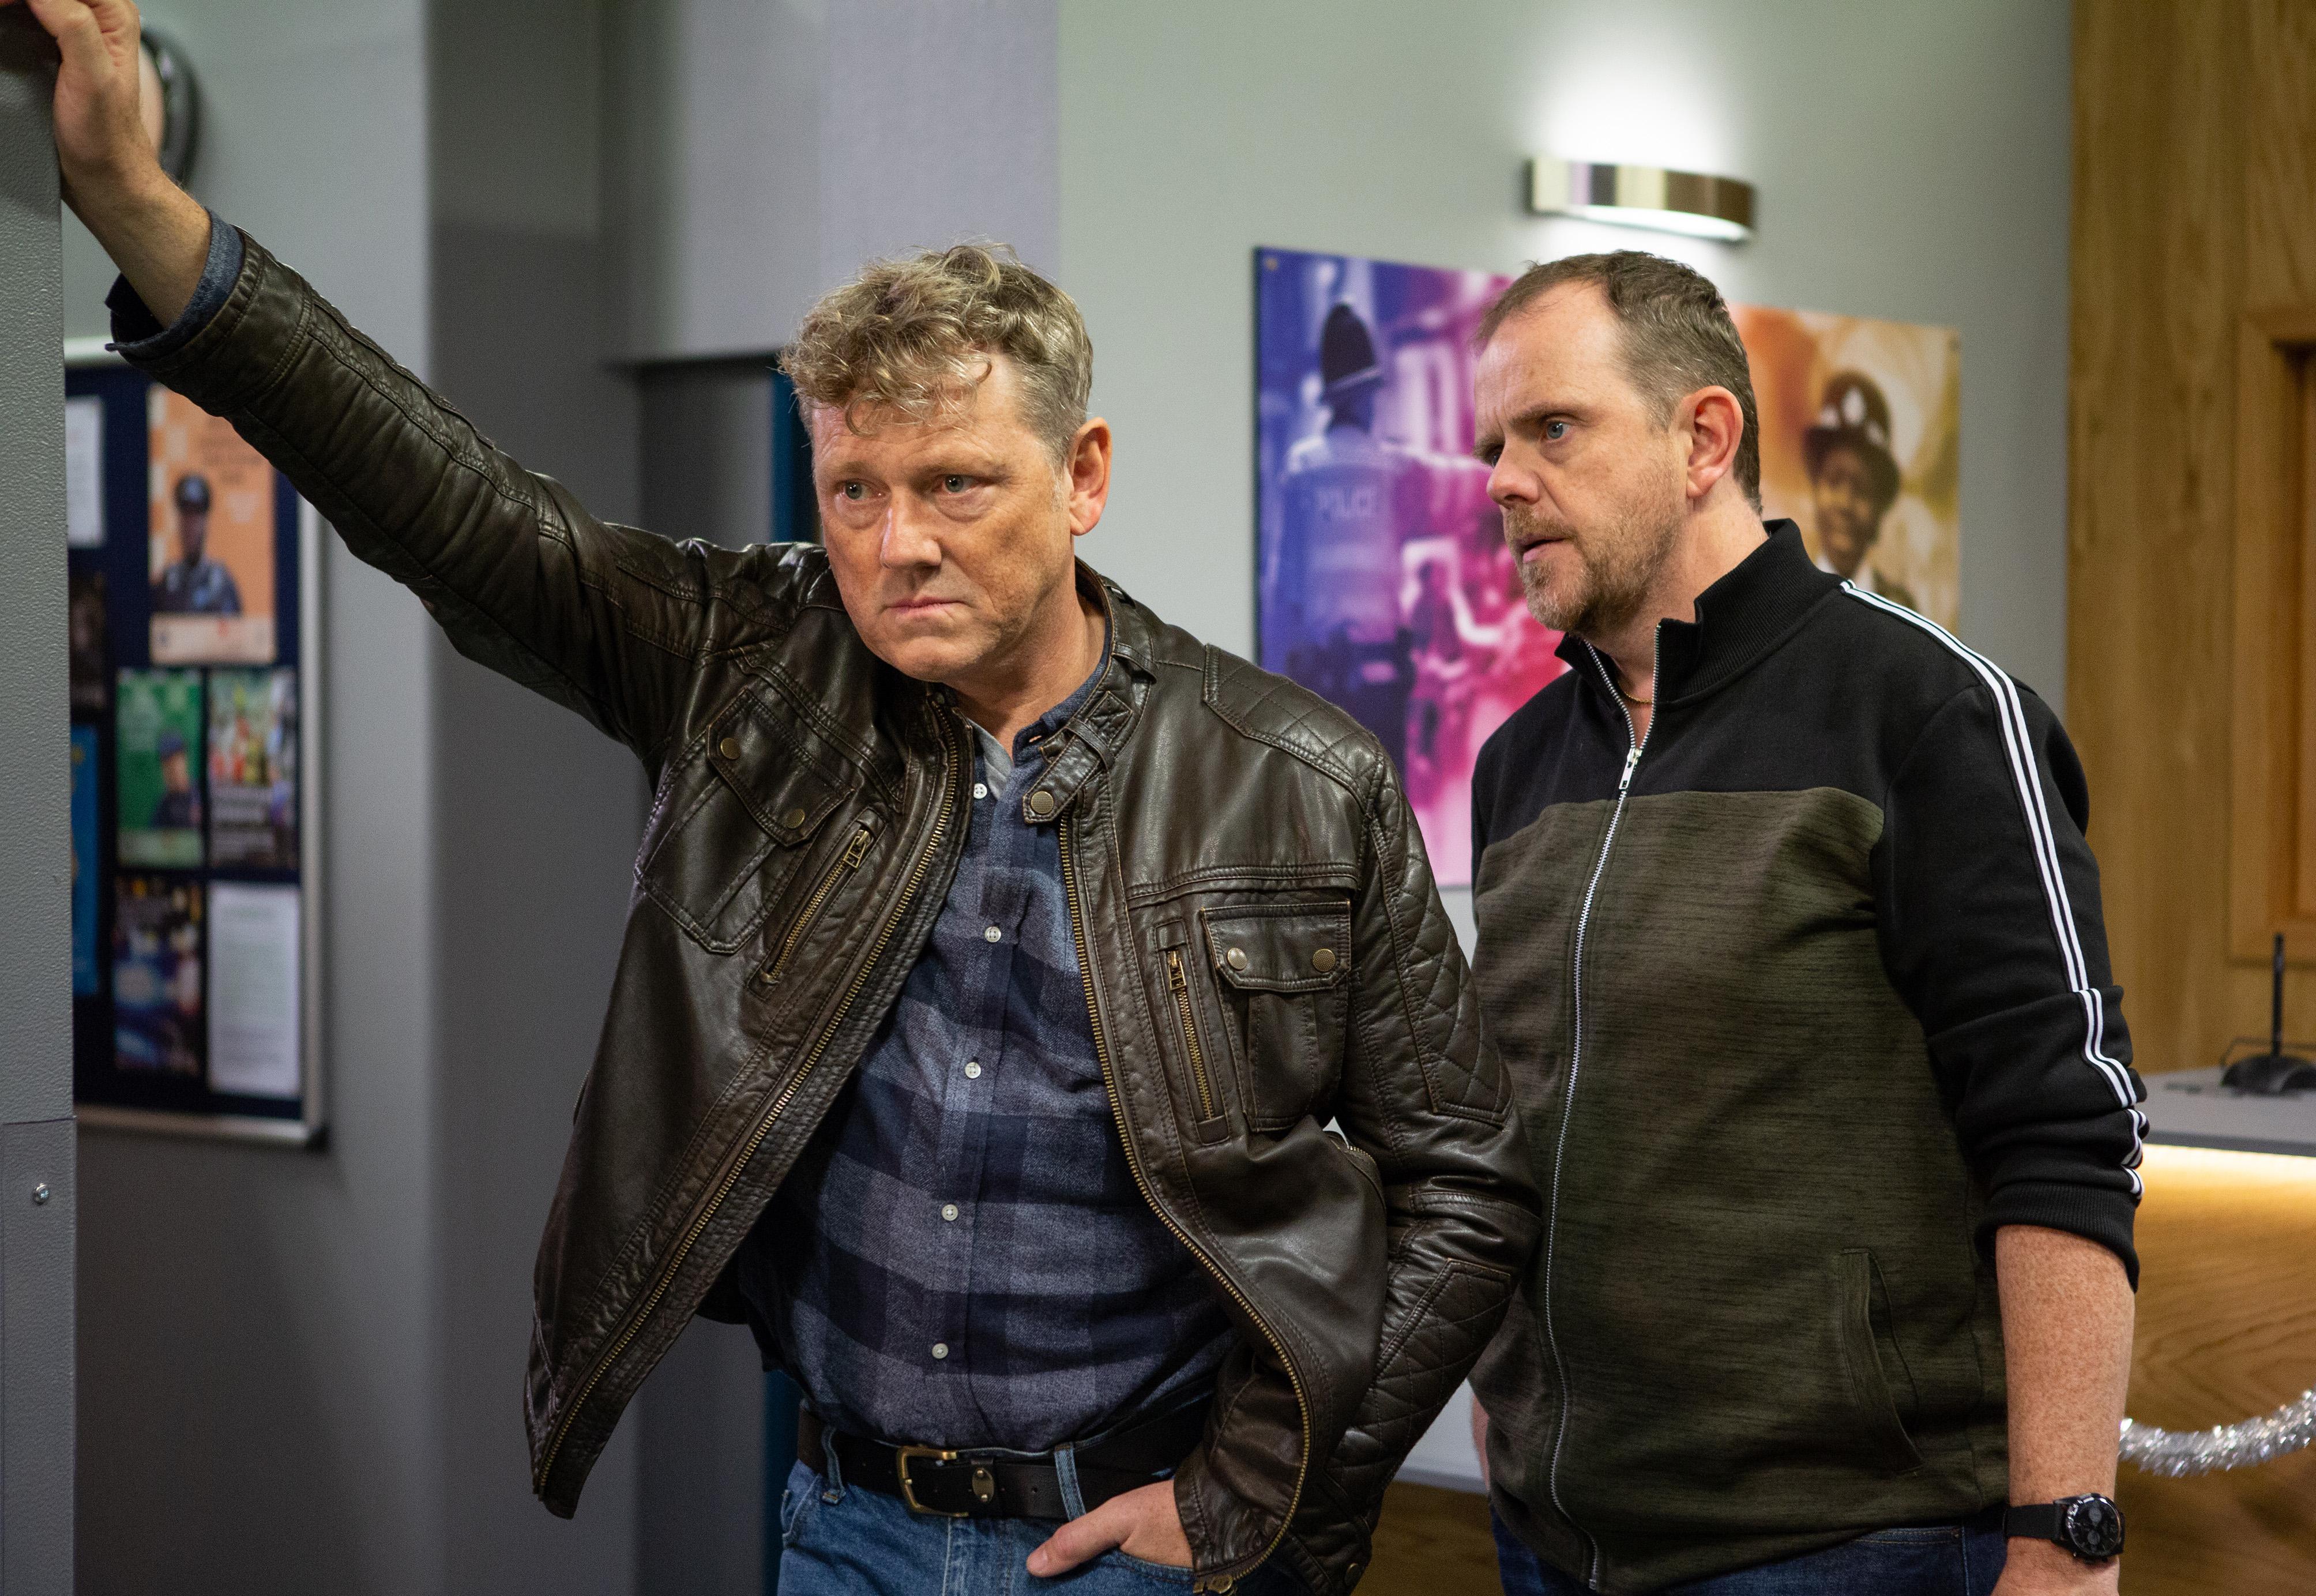 Emmerdale spoilers: Has Daz Spencer left the village?